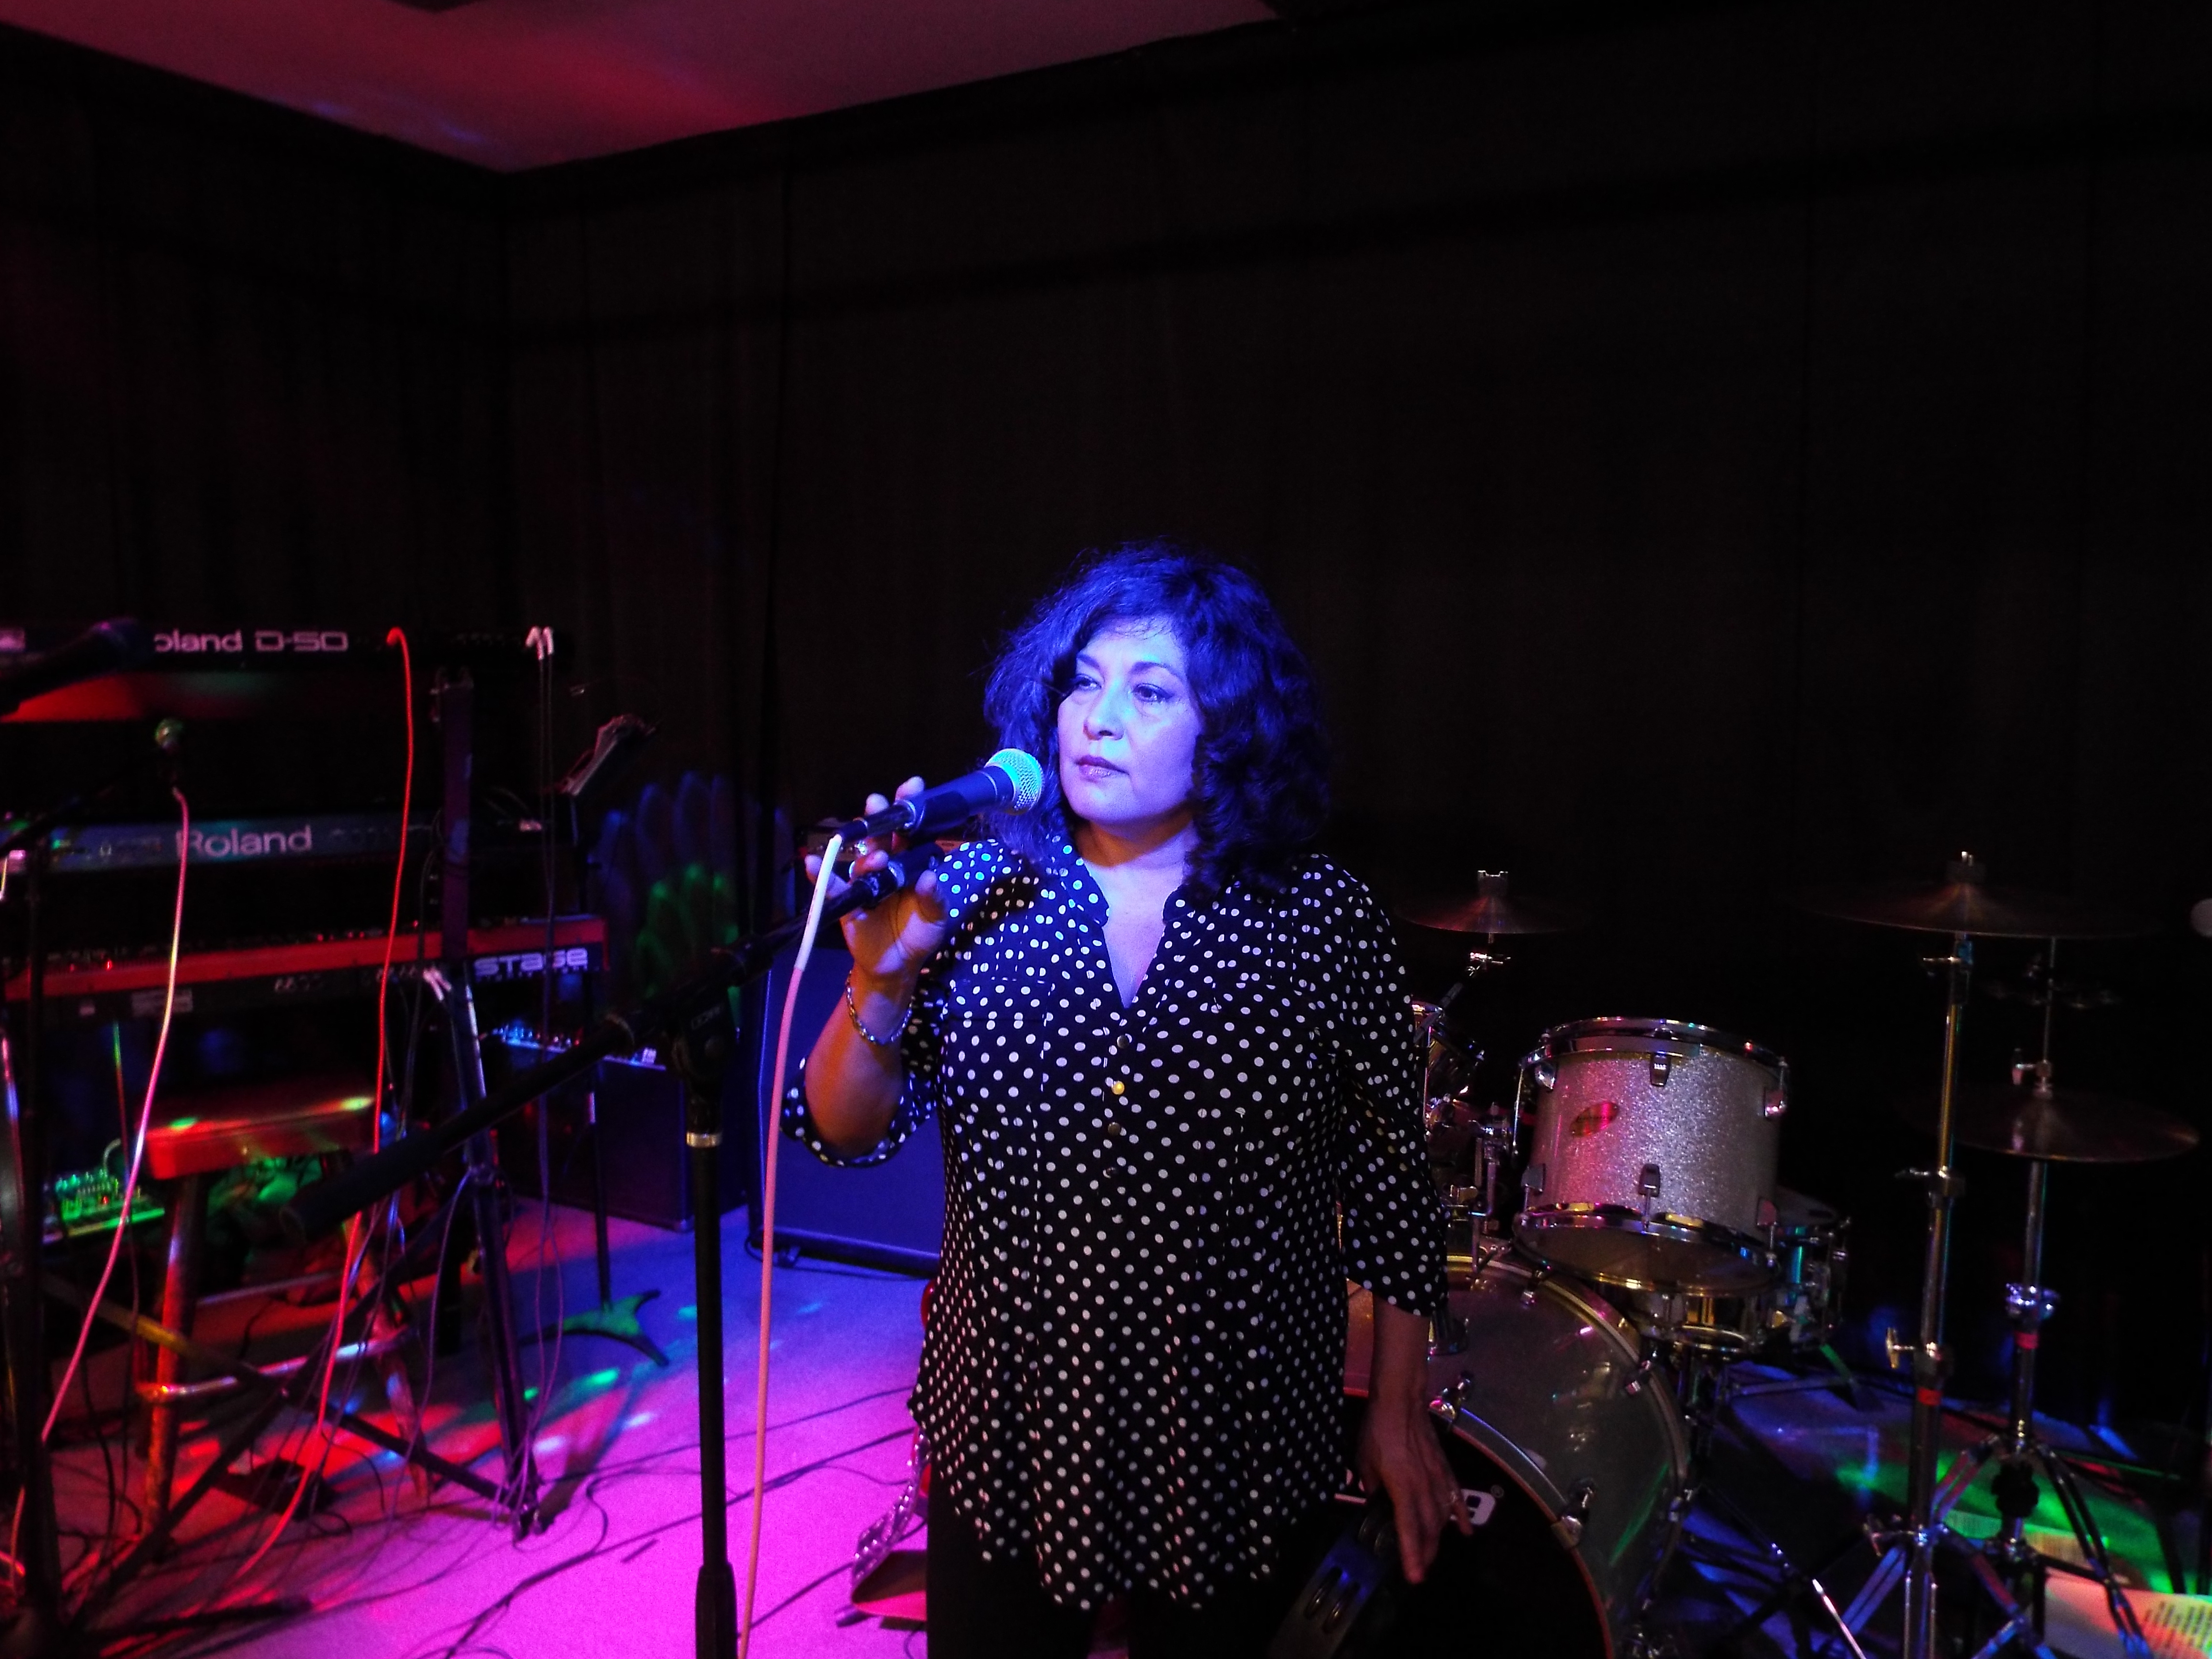 IRMA MALDONADO / LEAD VOCALS